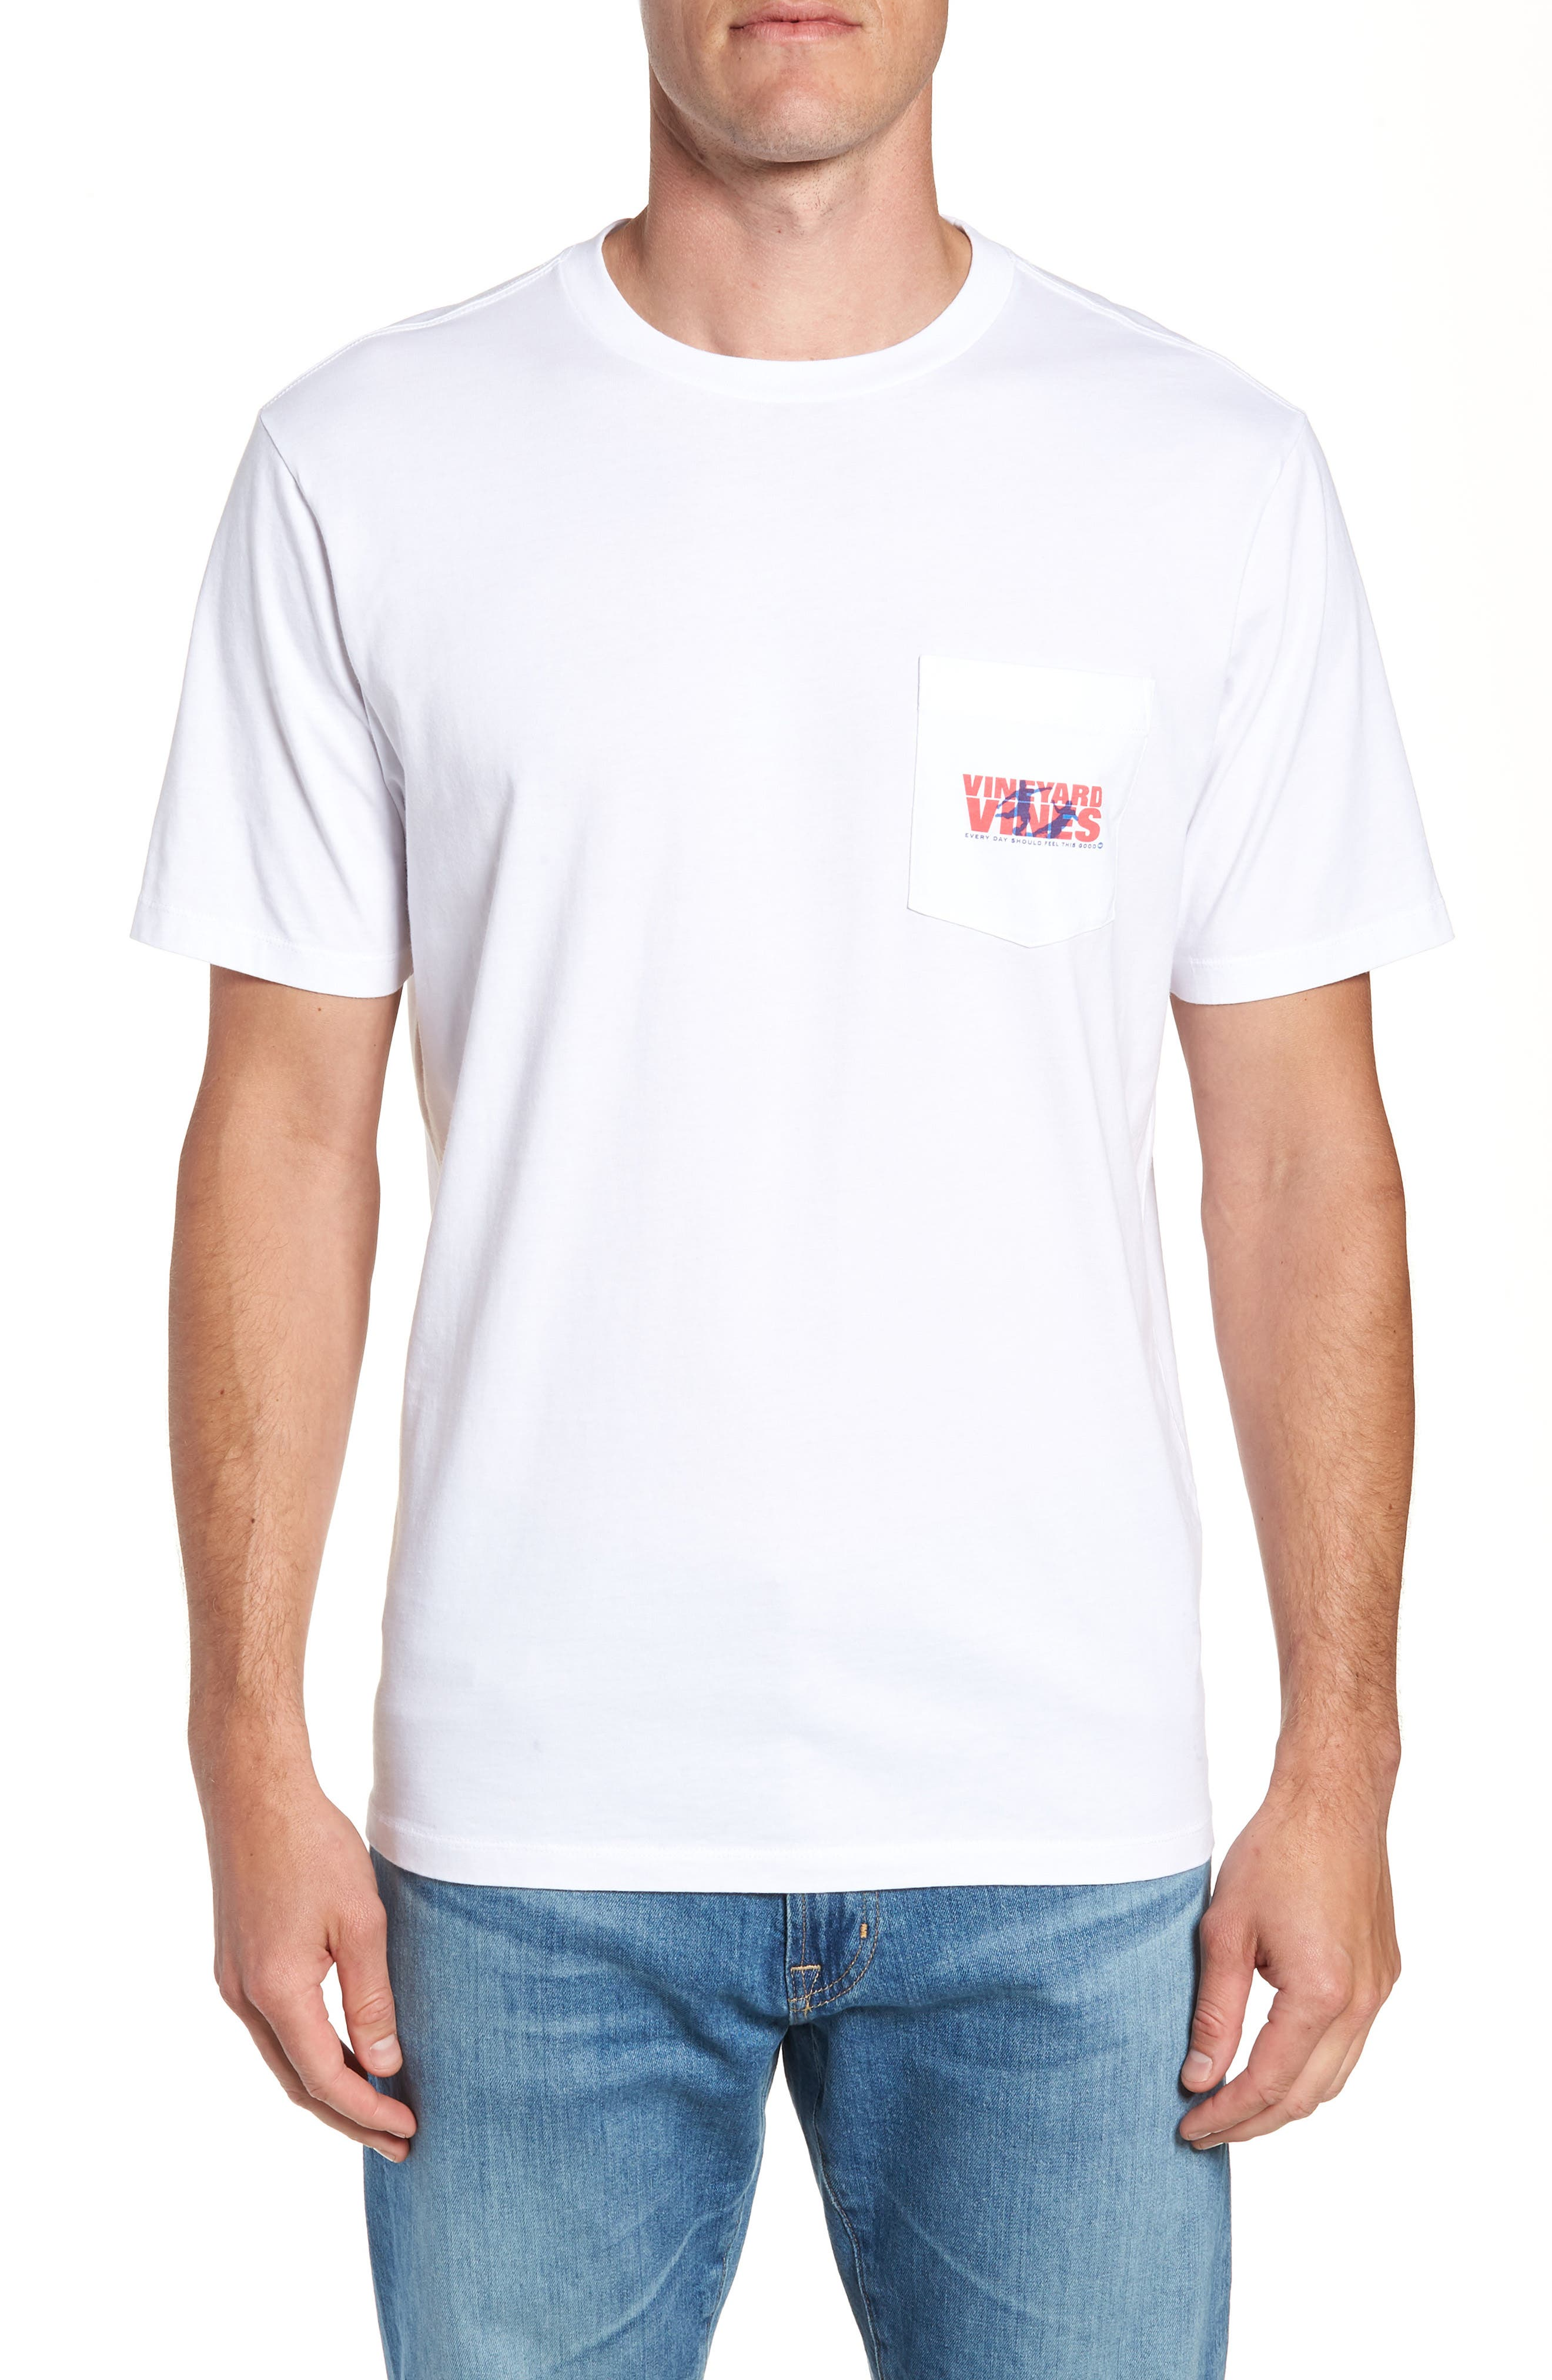 Knockout Soccer T-Shirt,                         Main,                         color, 100